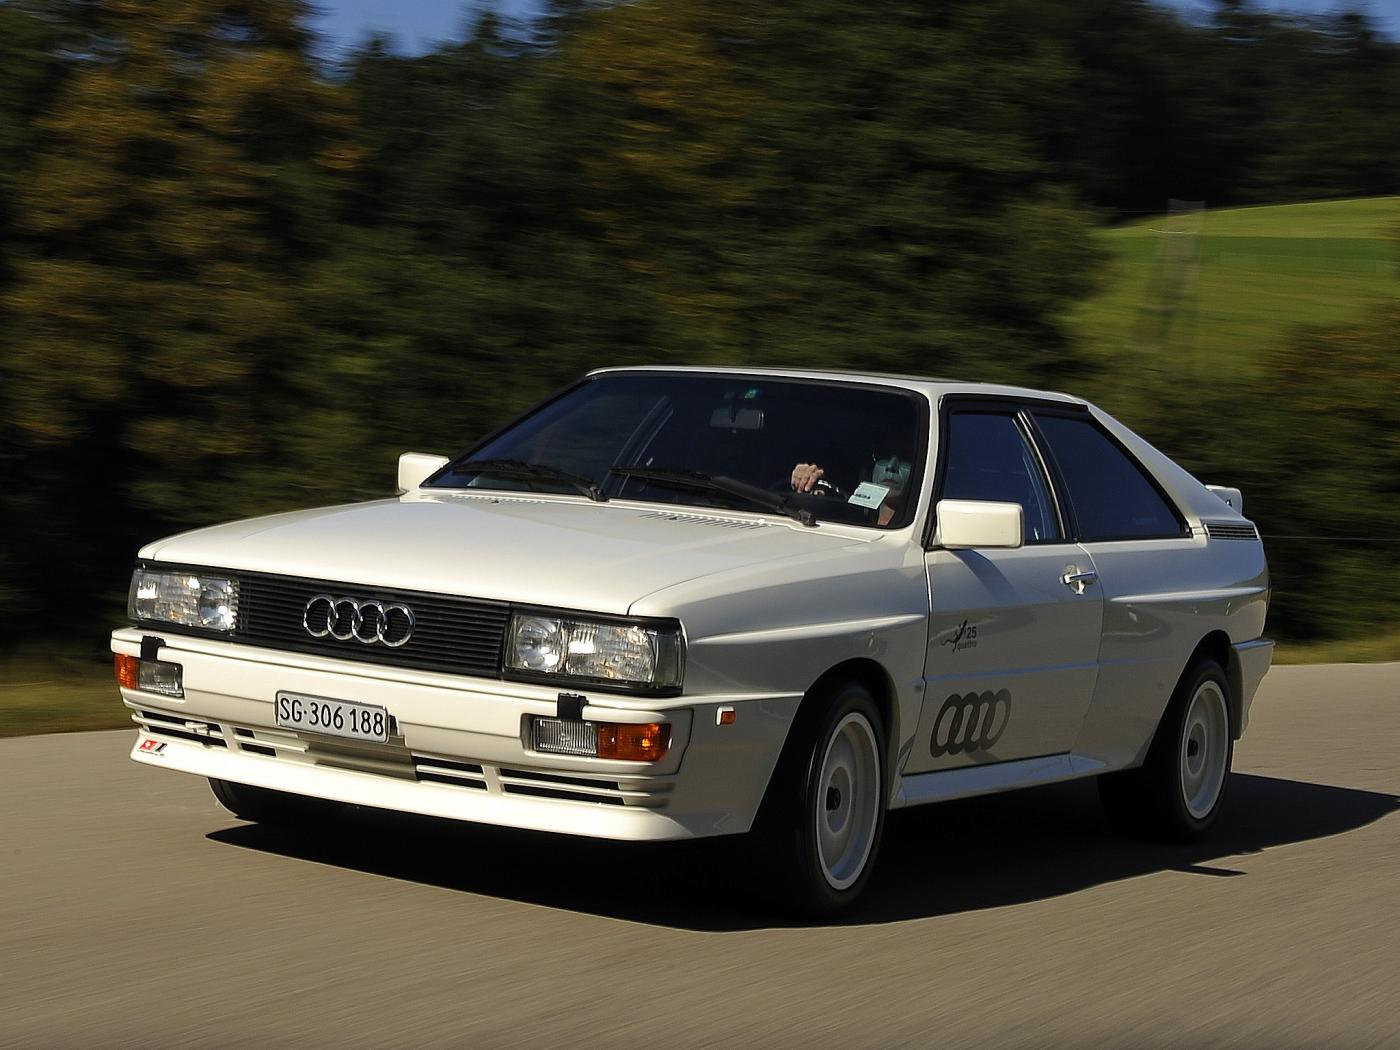 Audi-RR-5